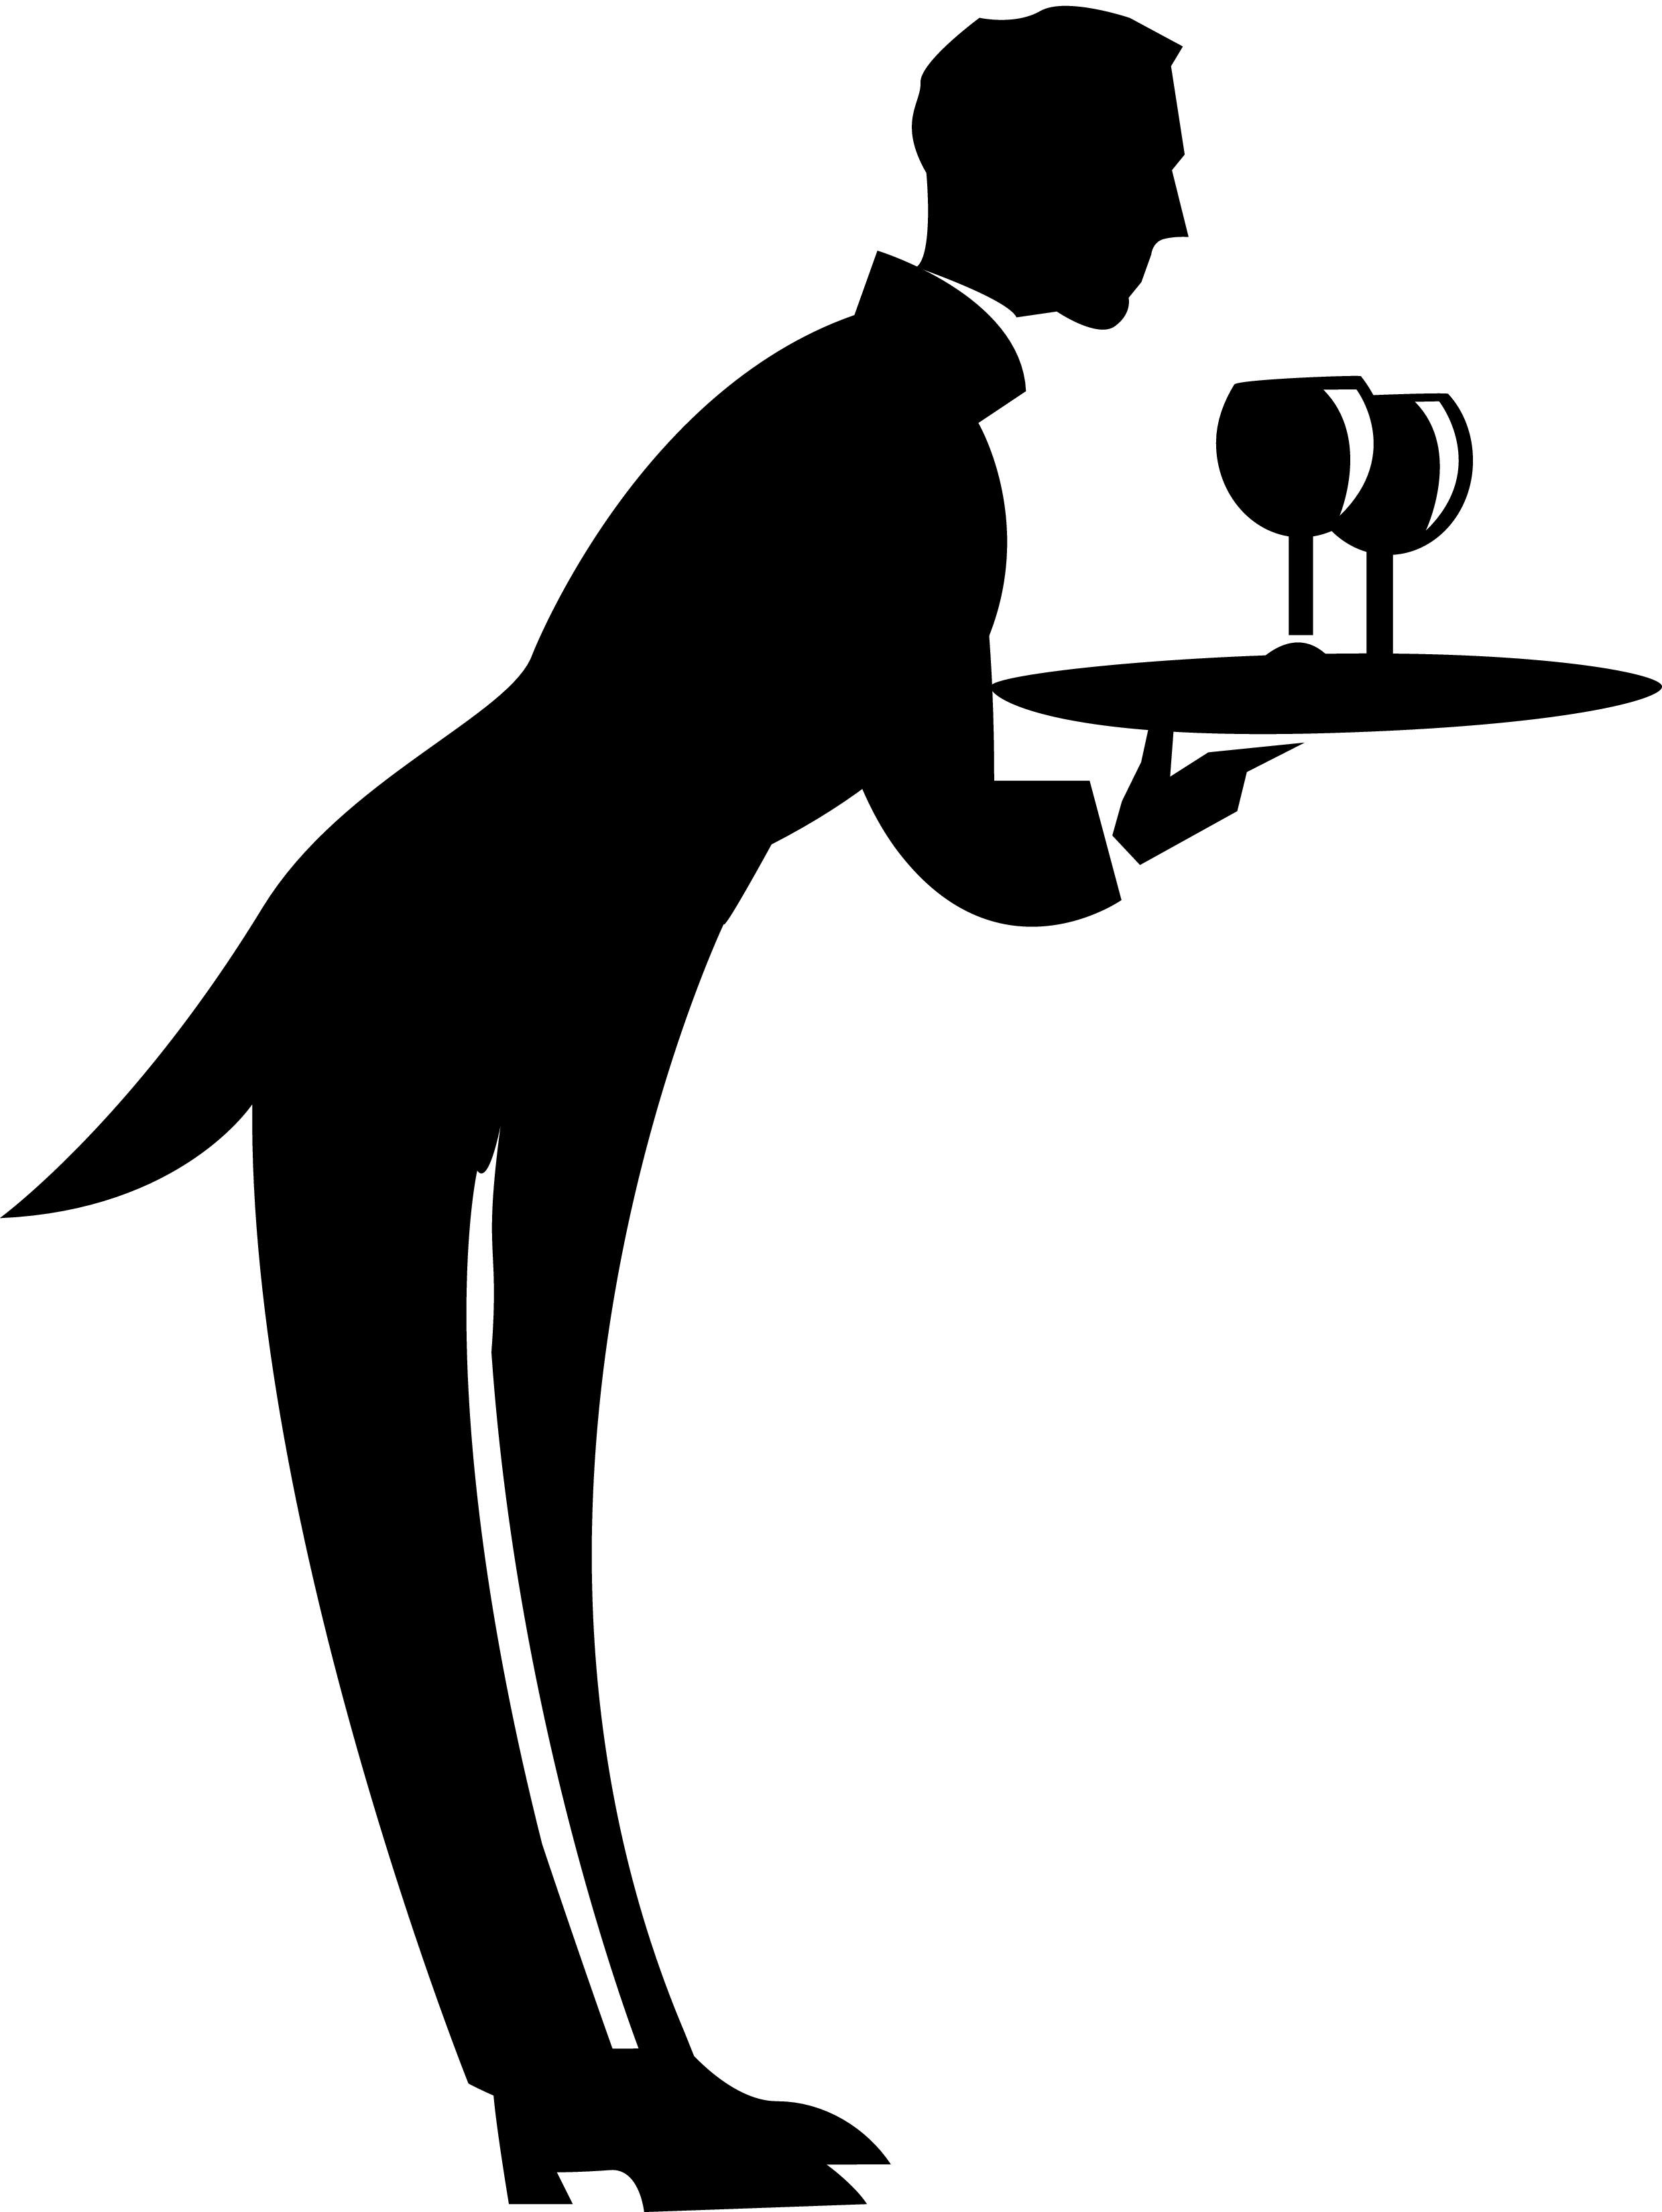 Waiter Clip Art N24 free image.